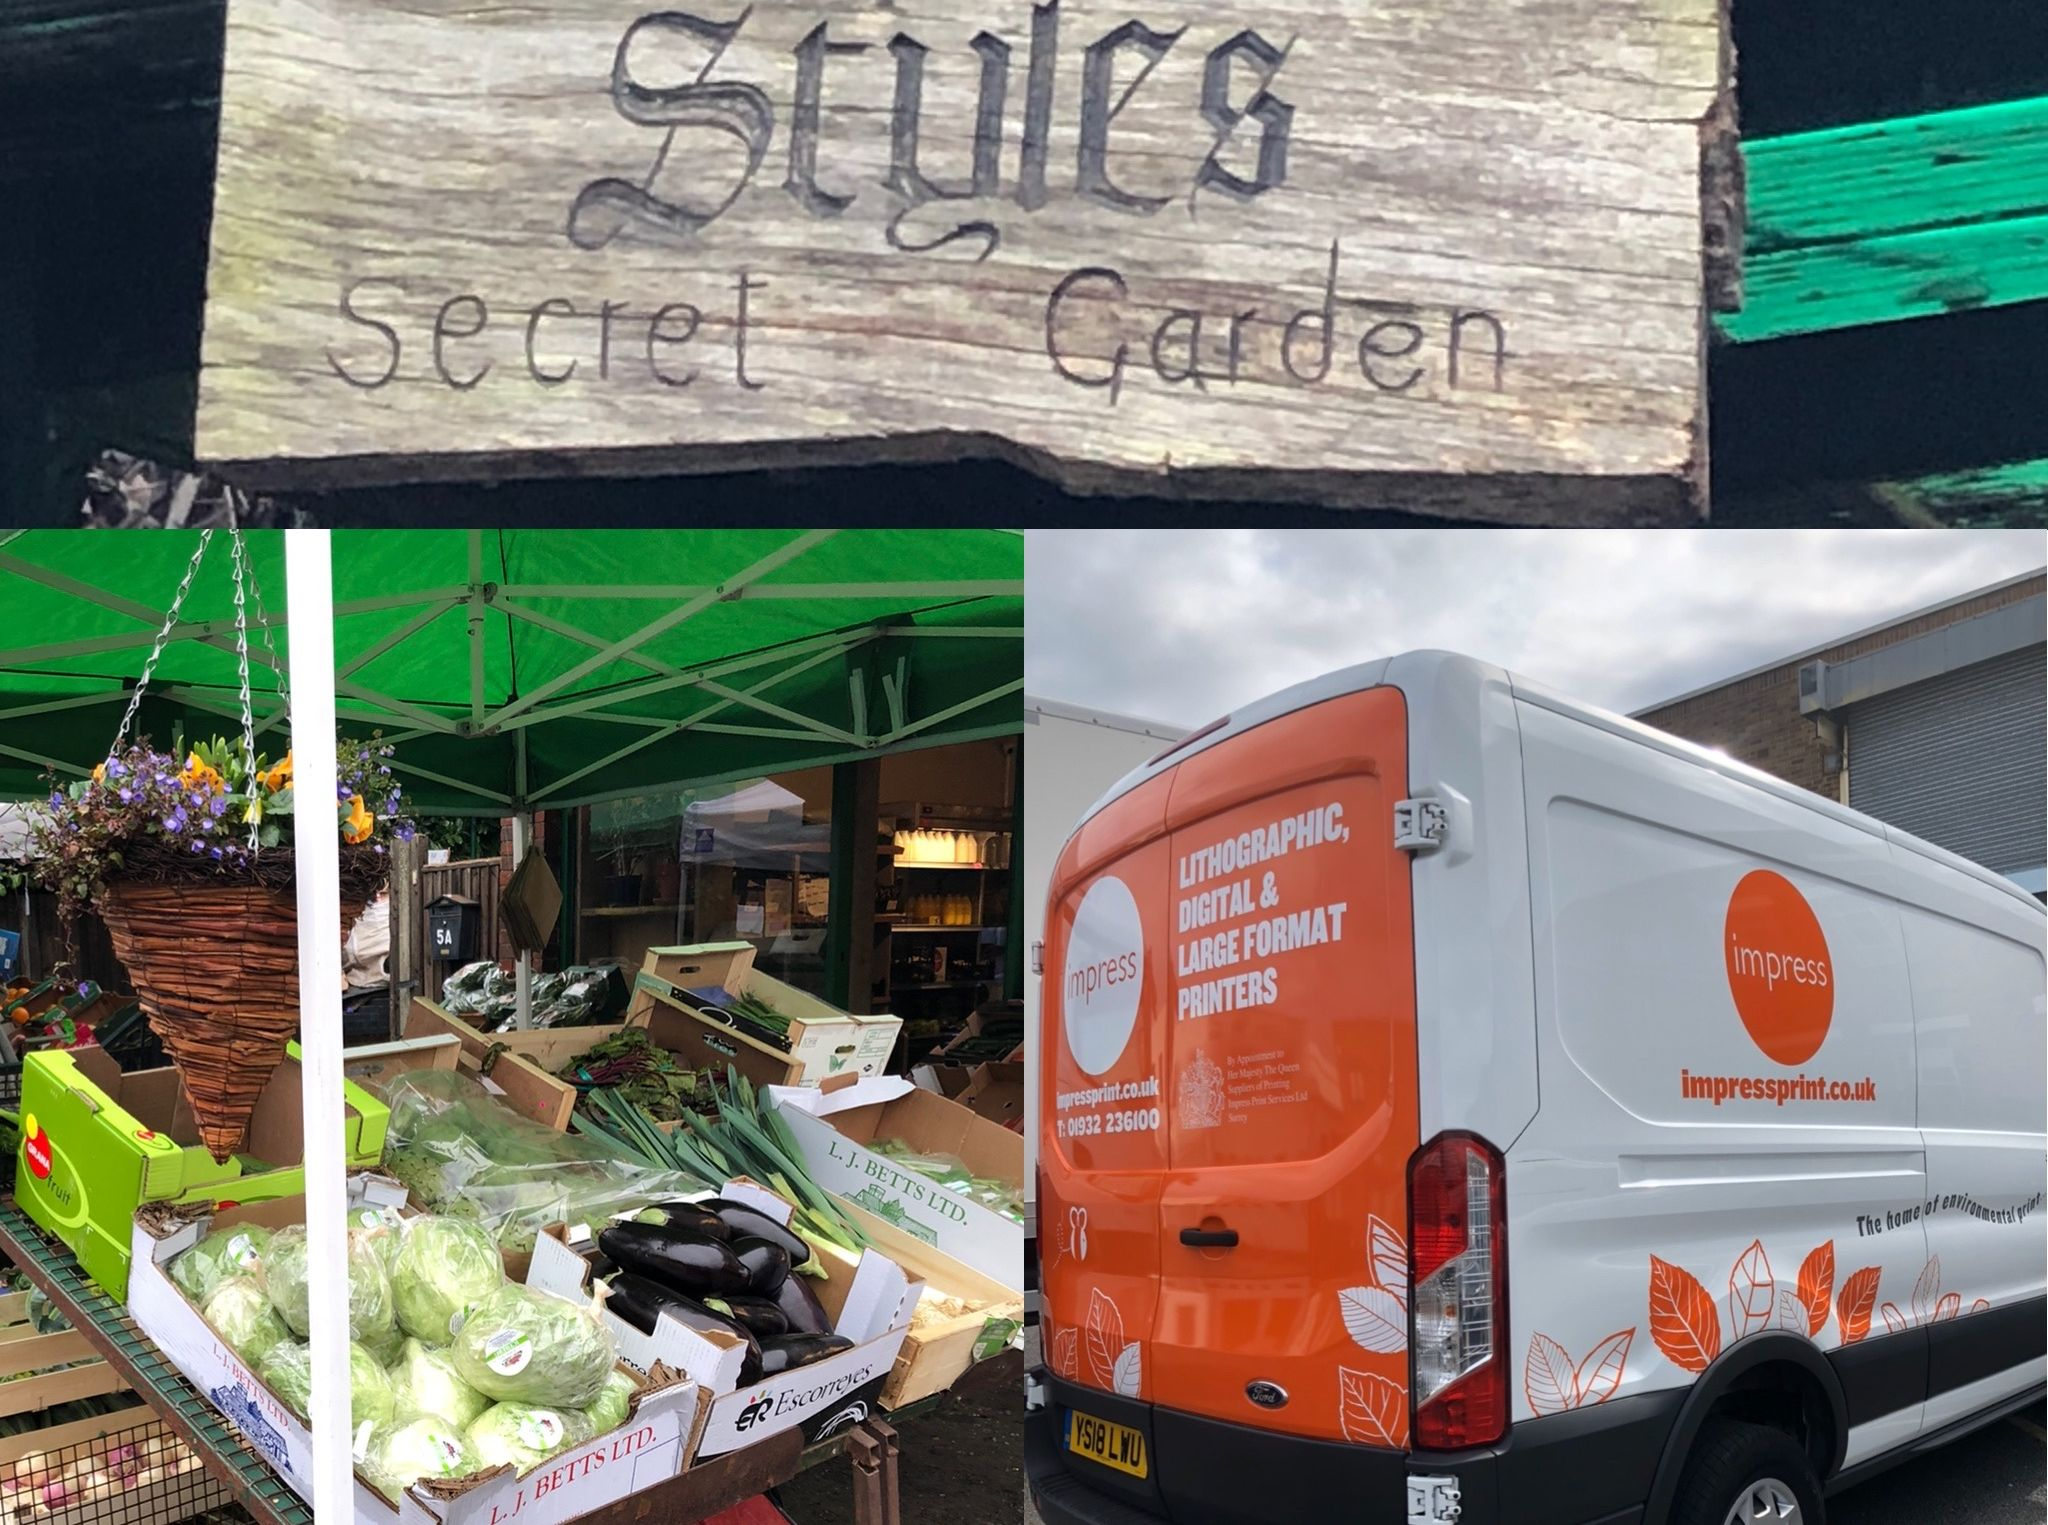 Helping greengrocer supporting communitiesames